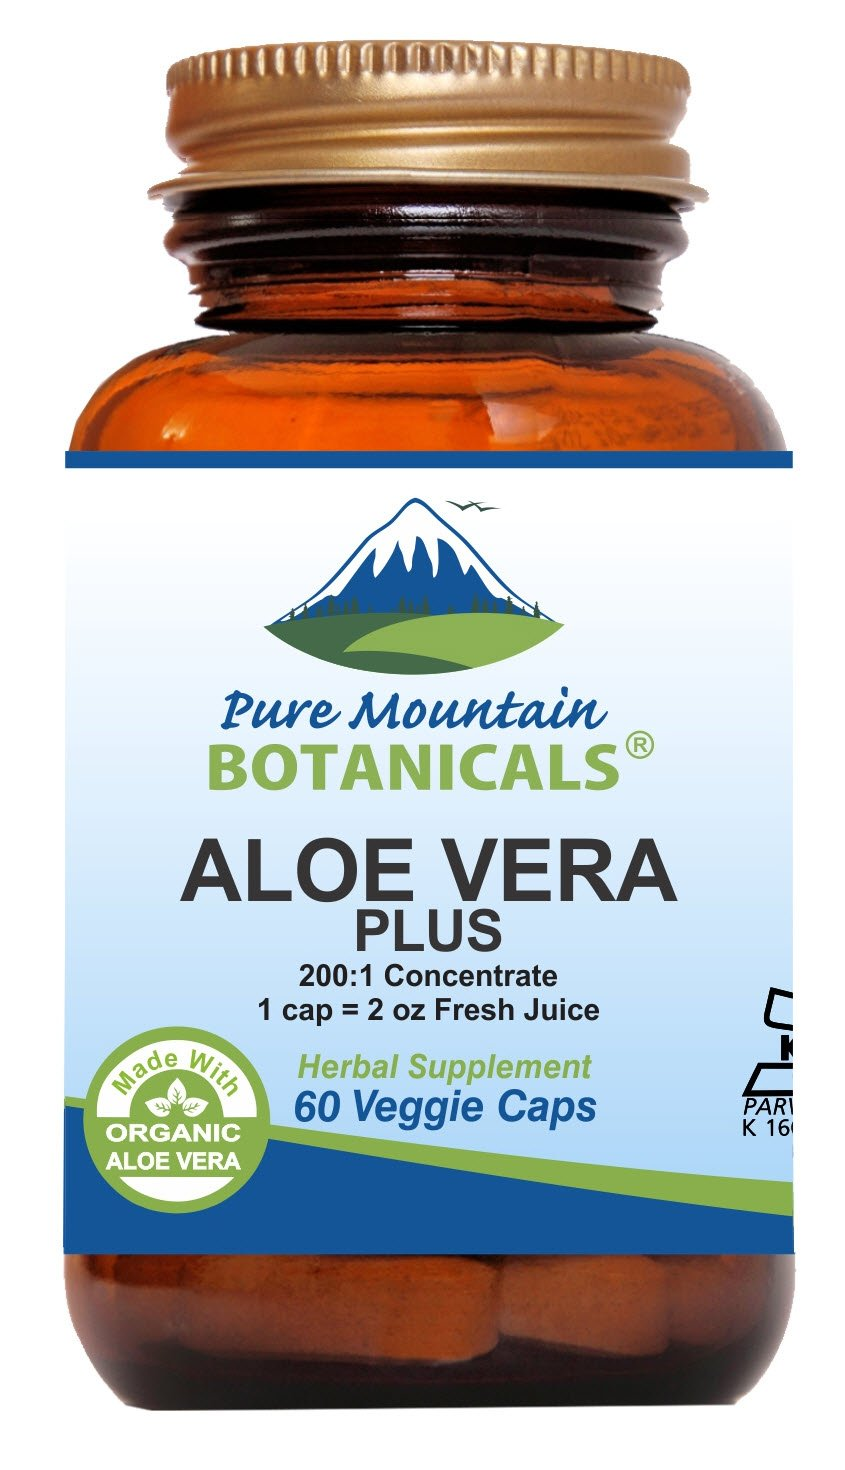 Aloe Vera Plus Capsules. 200 1 Extract. Kosher Organic Dried Aloe Vera Gel, Marshmallow Root, Slippery Elm